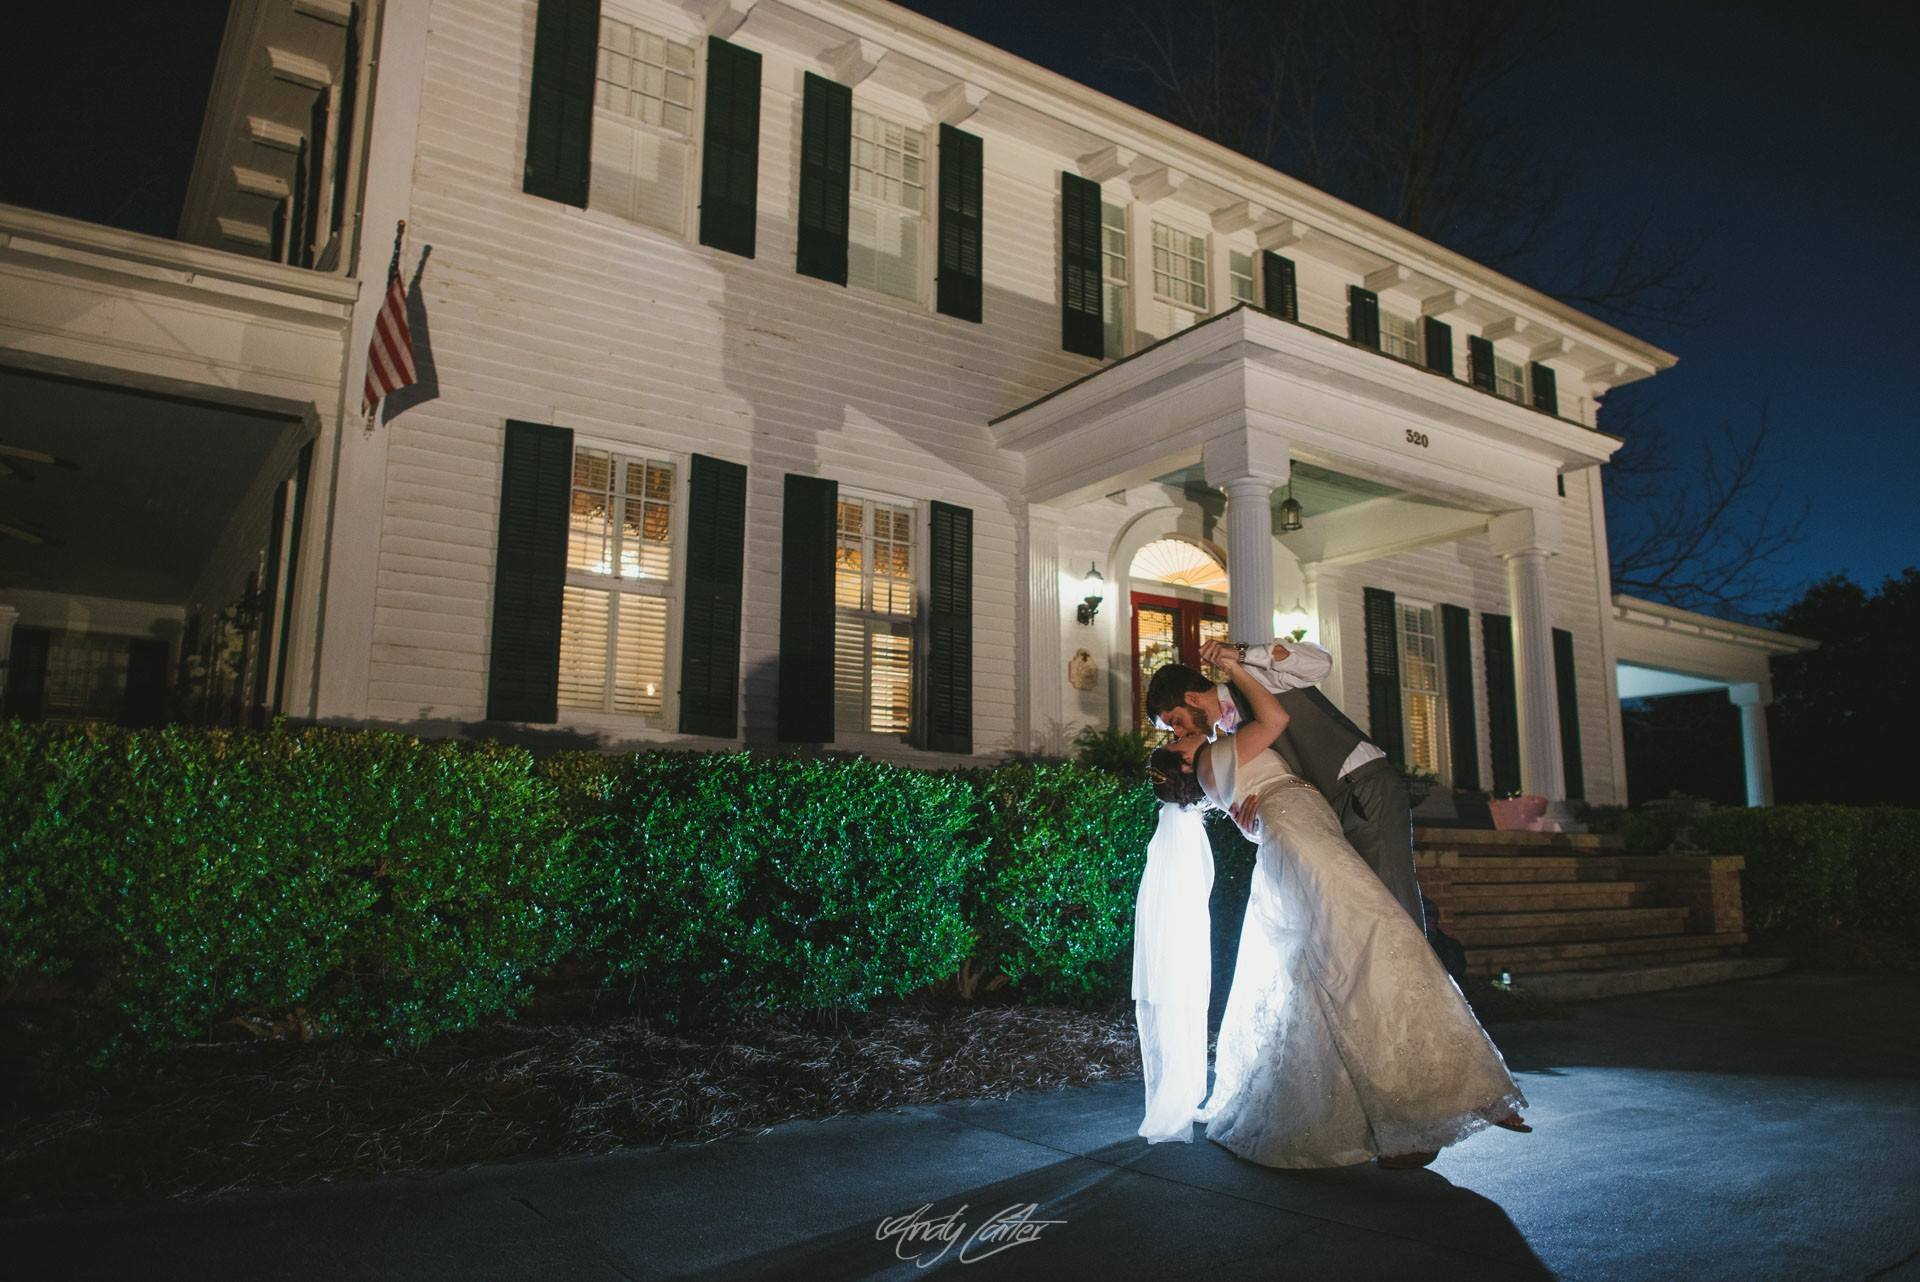 kiss the bride at the grand magnolia house.jpg